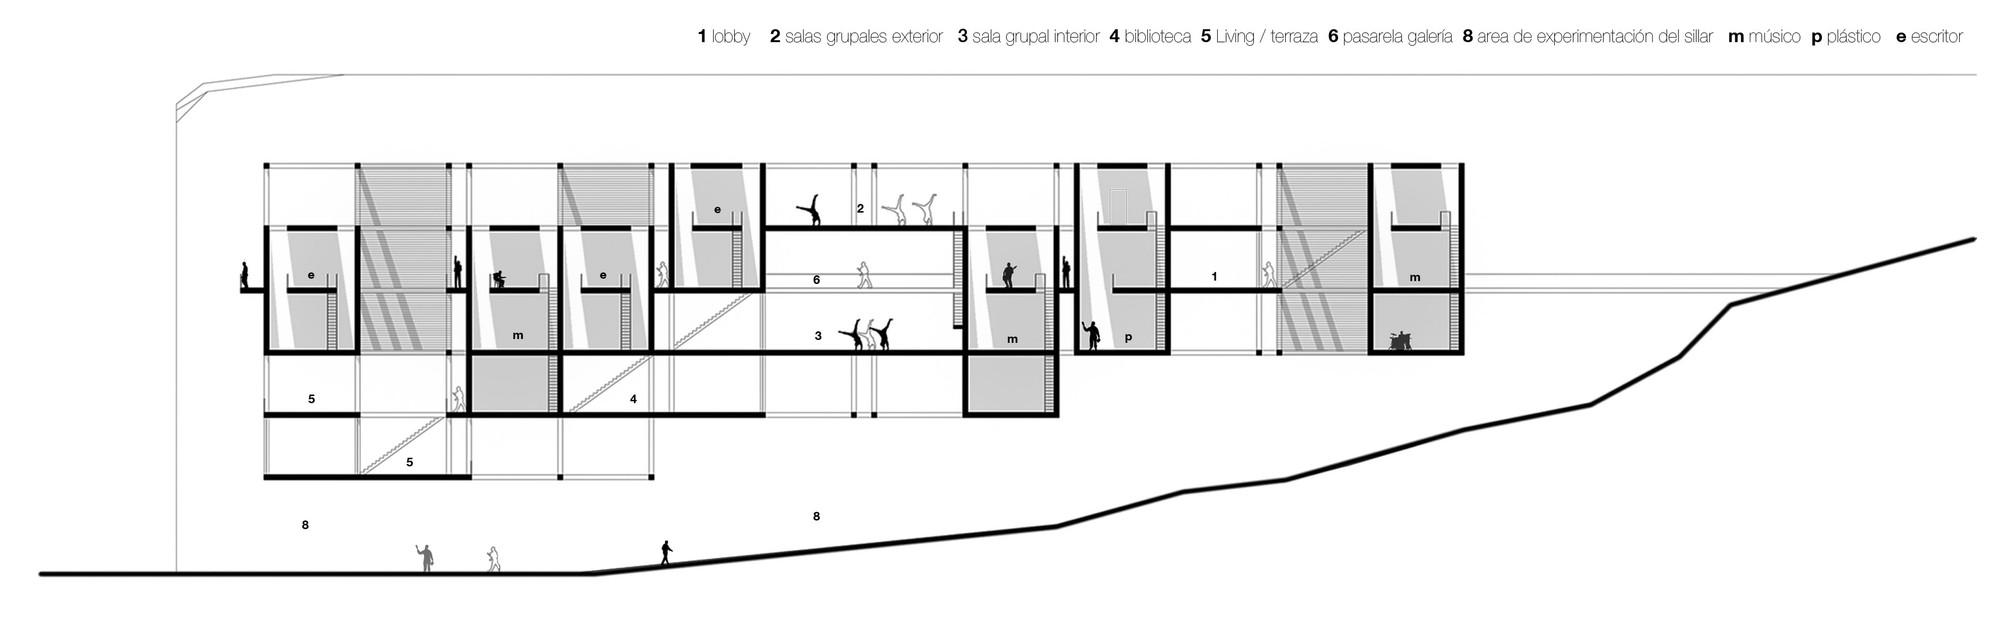 Corte/sección en talleres